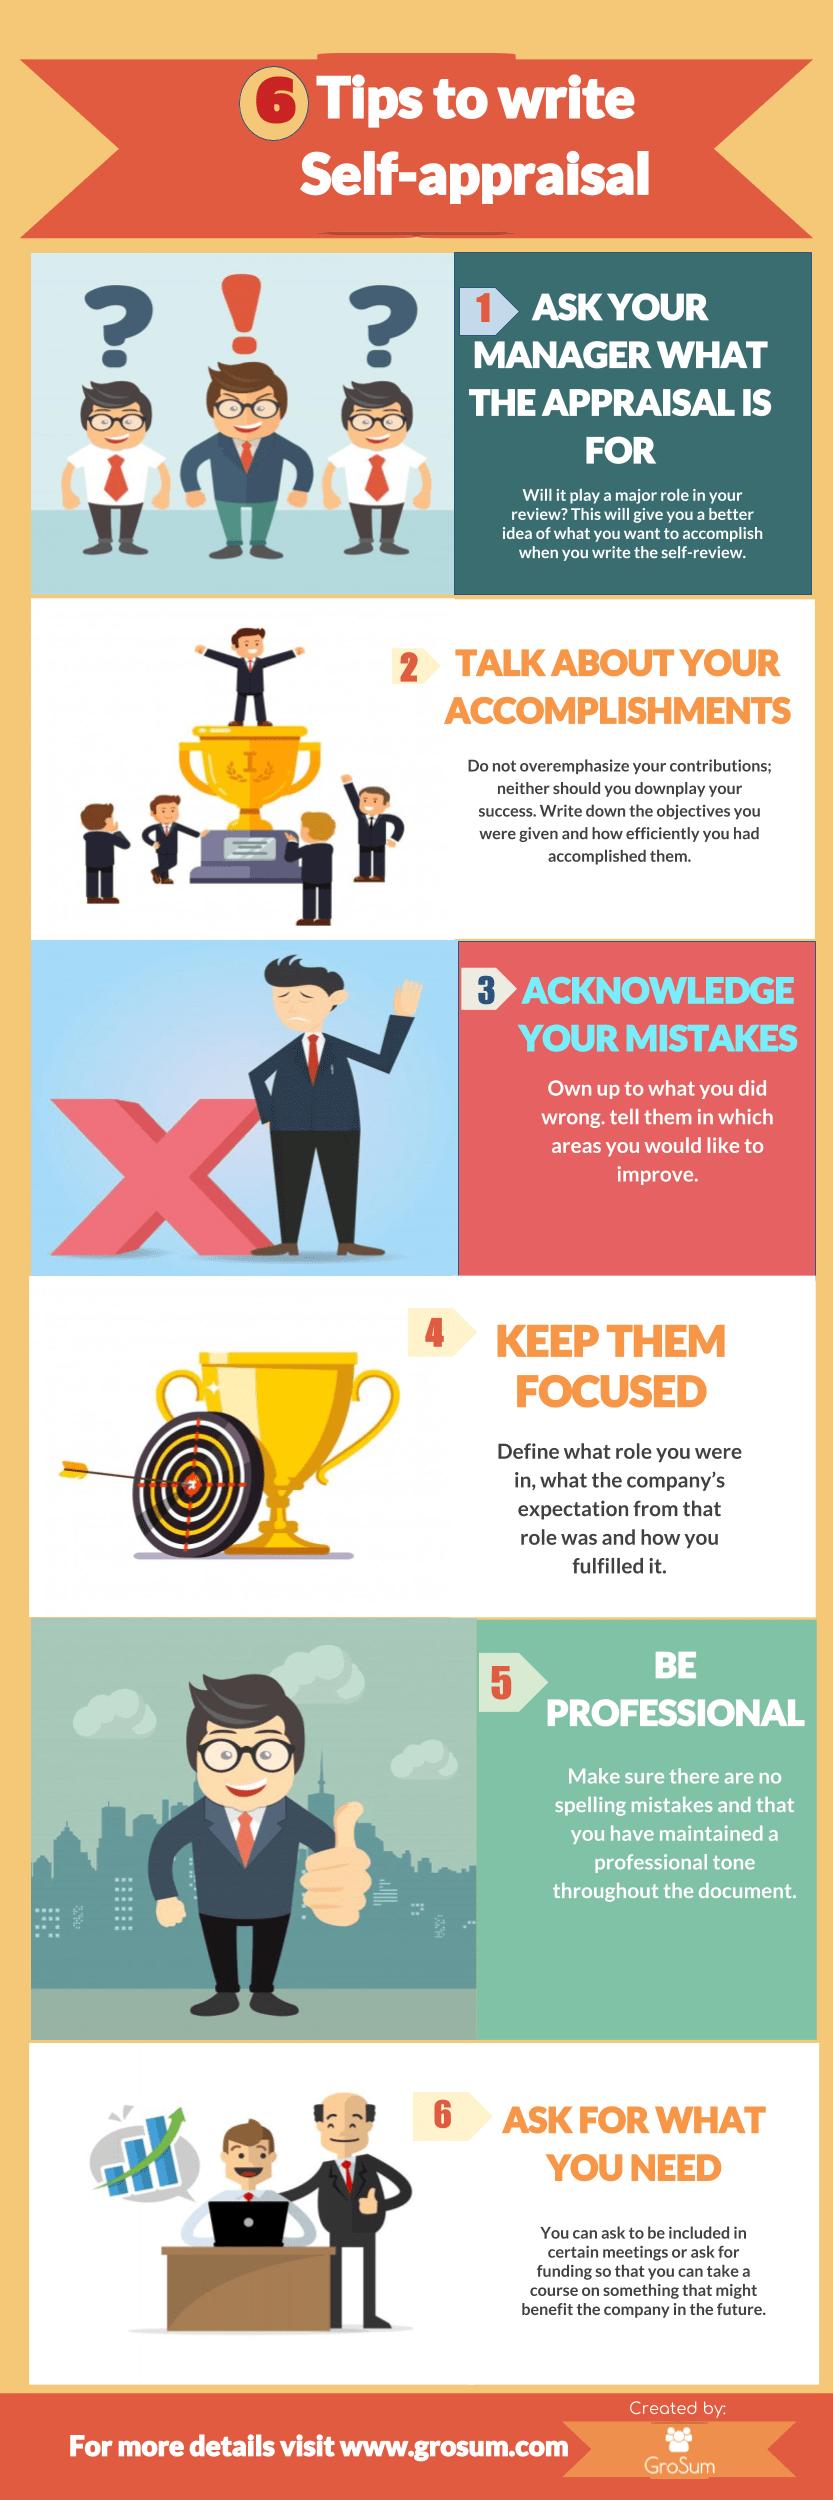 Tips for writing self-appraisal